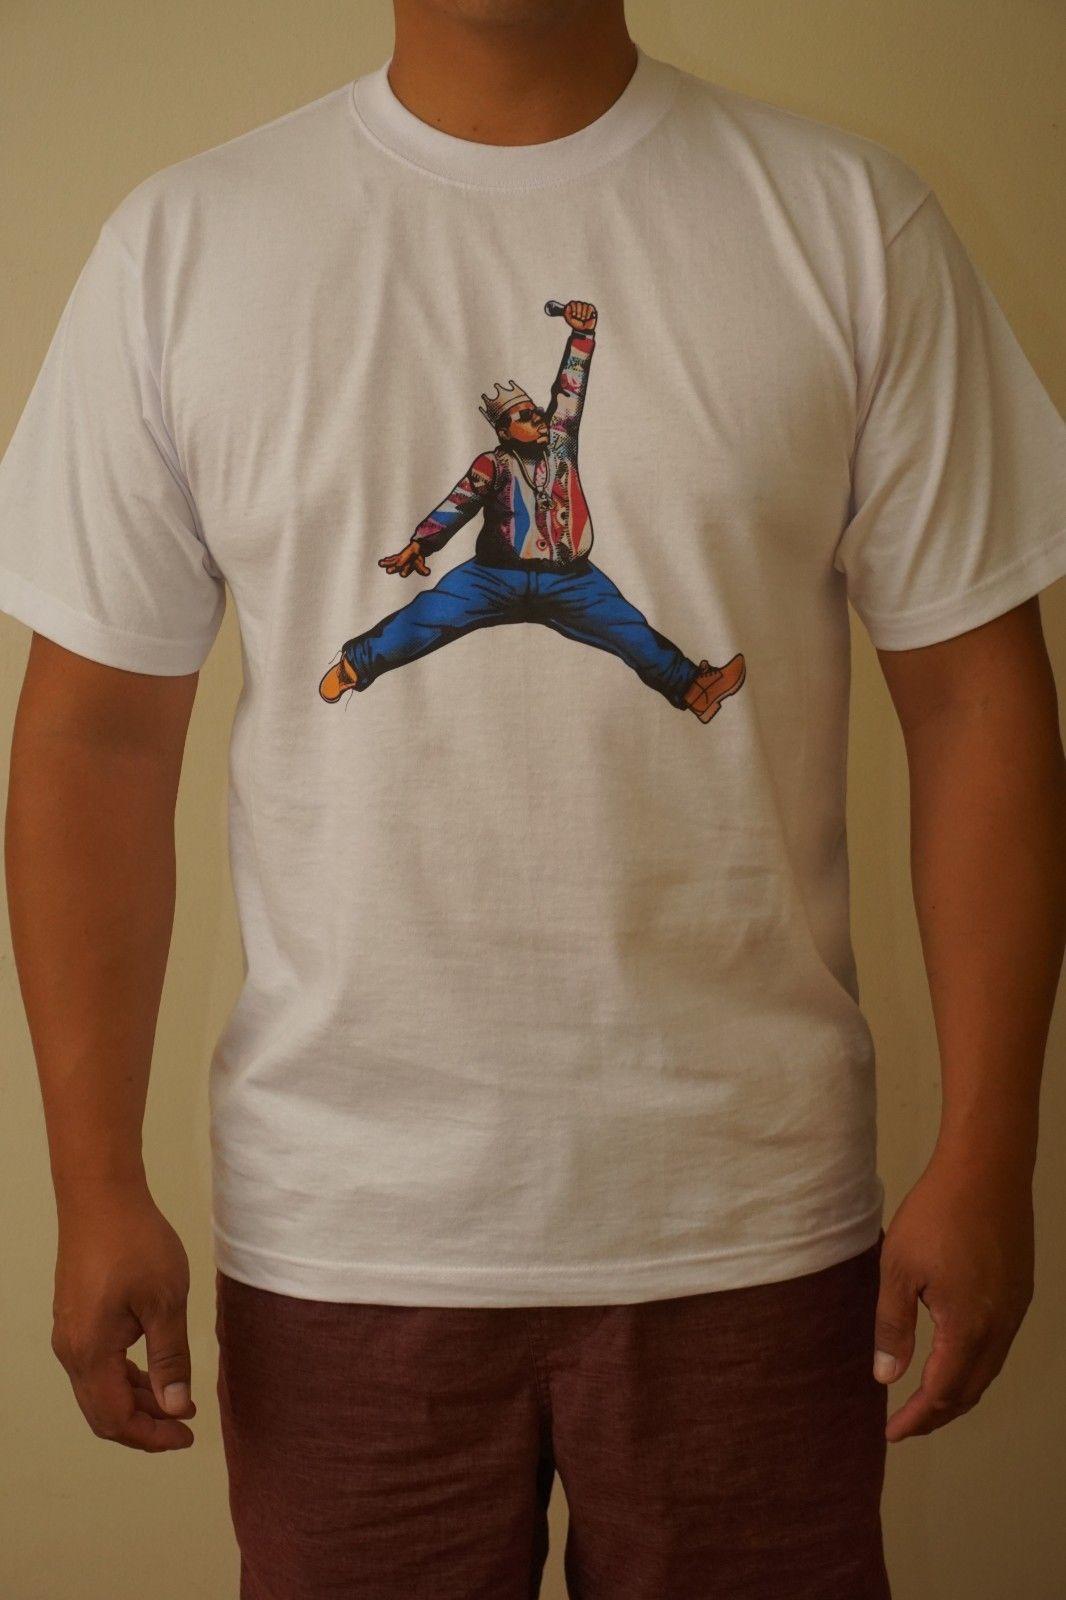 eed6b1448cc3 Hip Hop Jumpman Notorious BIG Biggie Smalls Short Sleeve T Shirt MEDIUM Men  Women Unisex Fashion Tshirt Funny T Shirt Slogans Shirt Shirt From ...